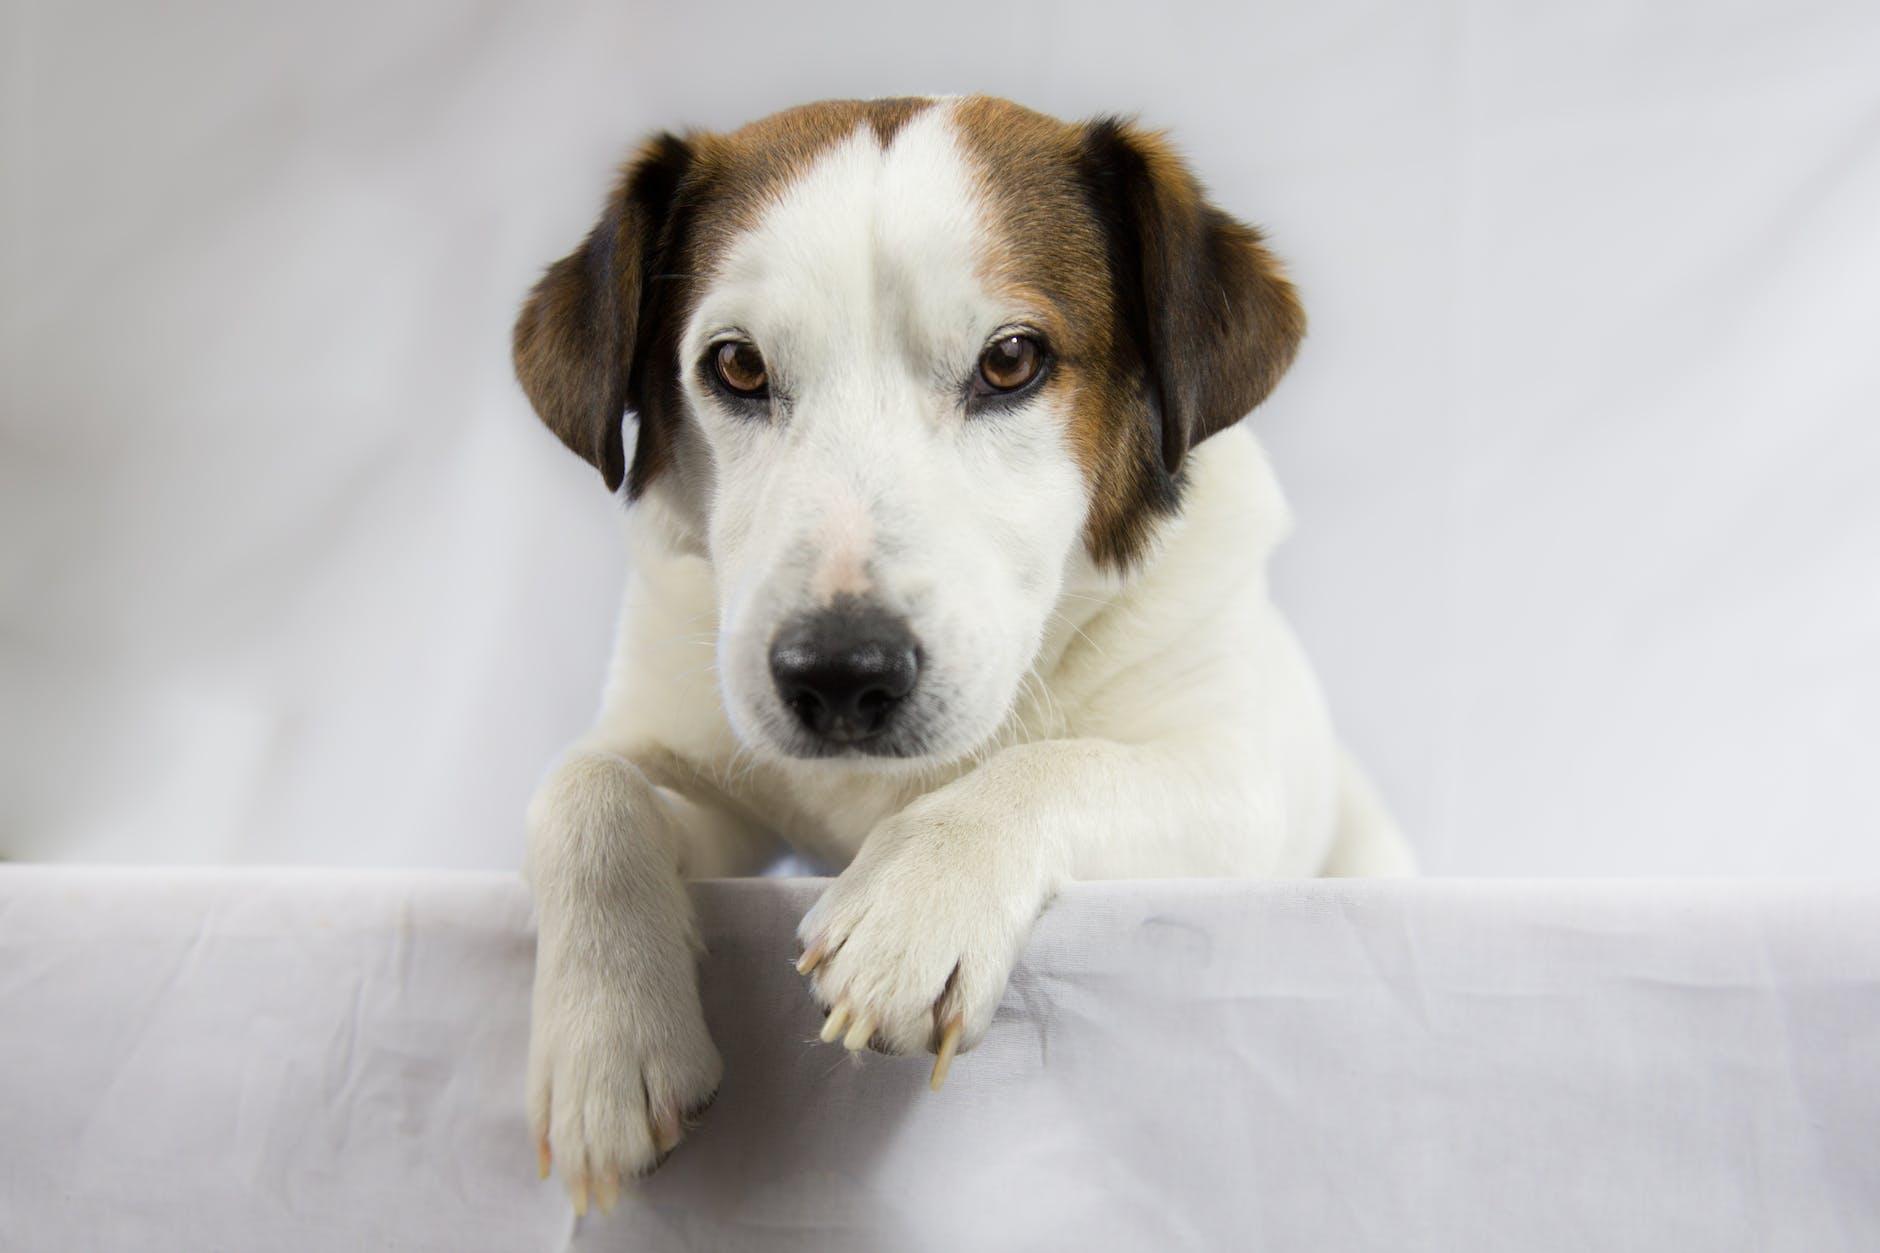 portrait of a cute dog